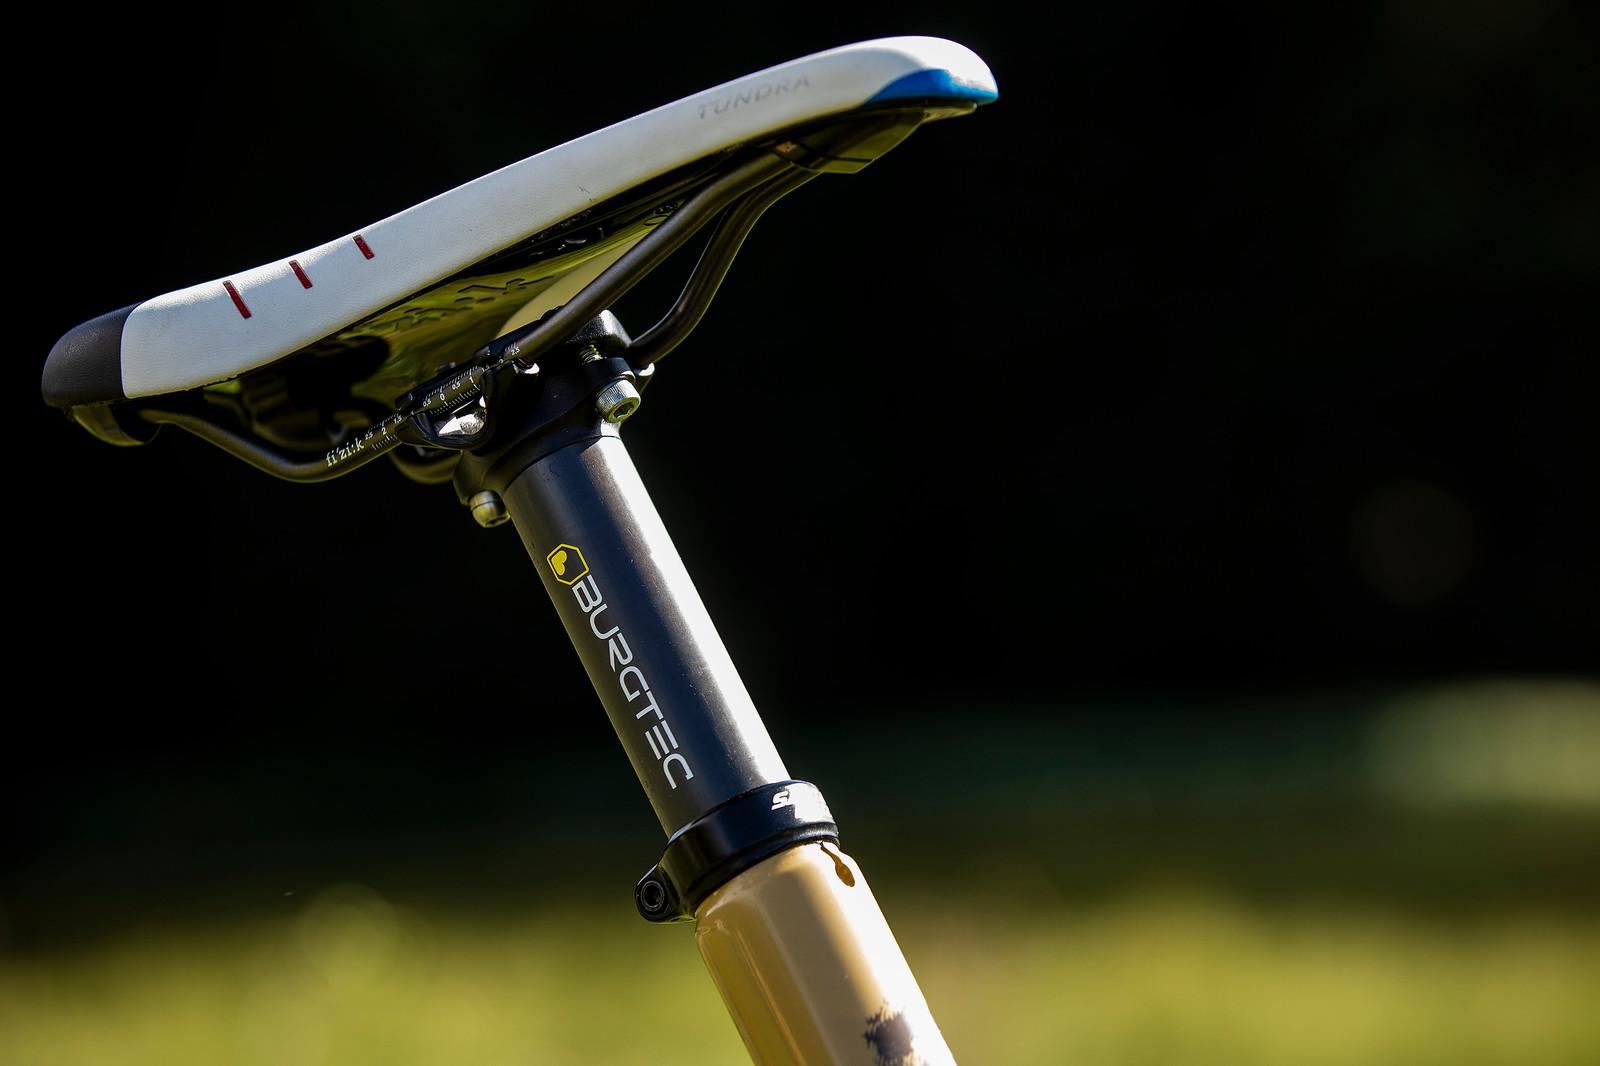 Angled - WORLD CHAMPS BIKE - Greg Minnaar's Santa Cruz V10 - Mountain Biking Pictures - Vital MTB